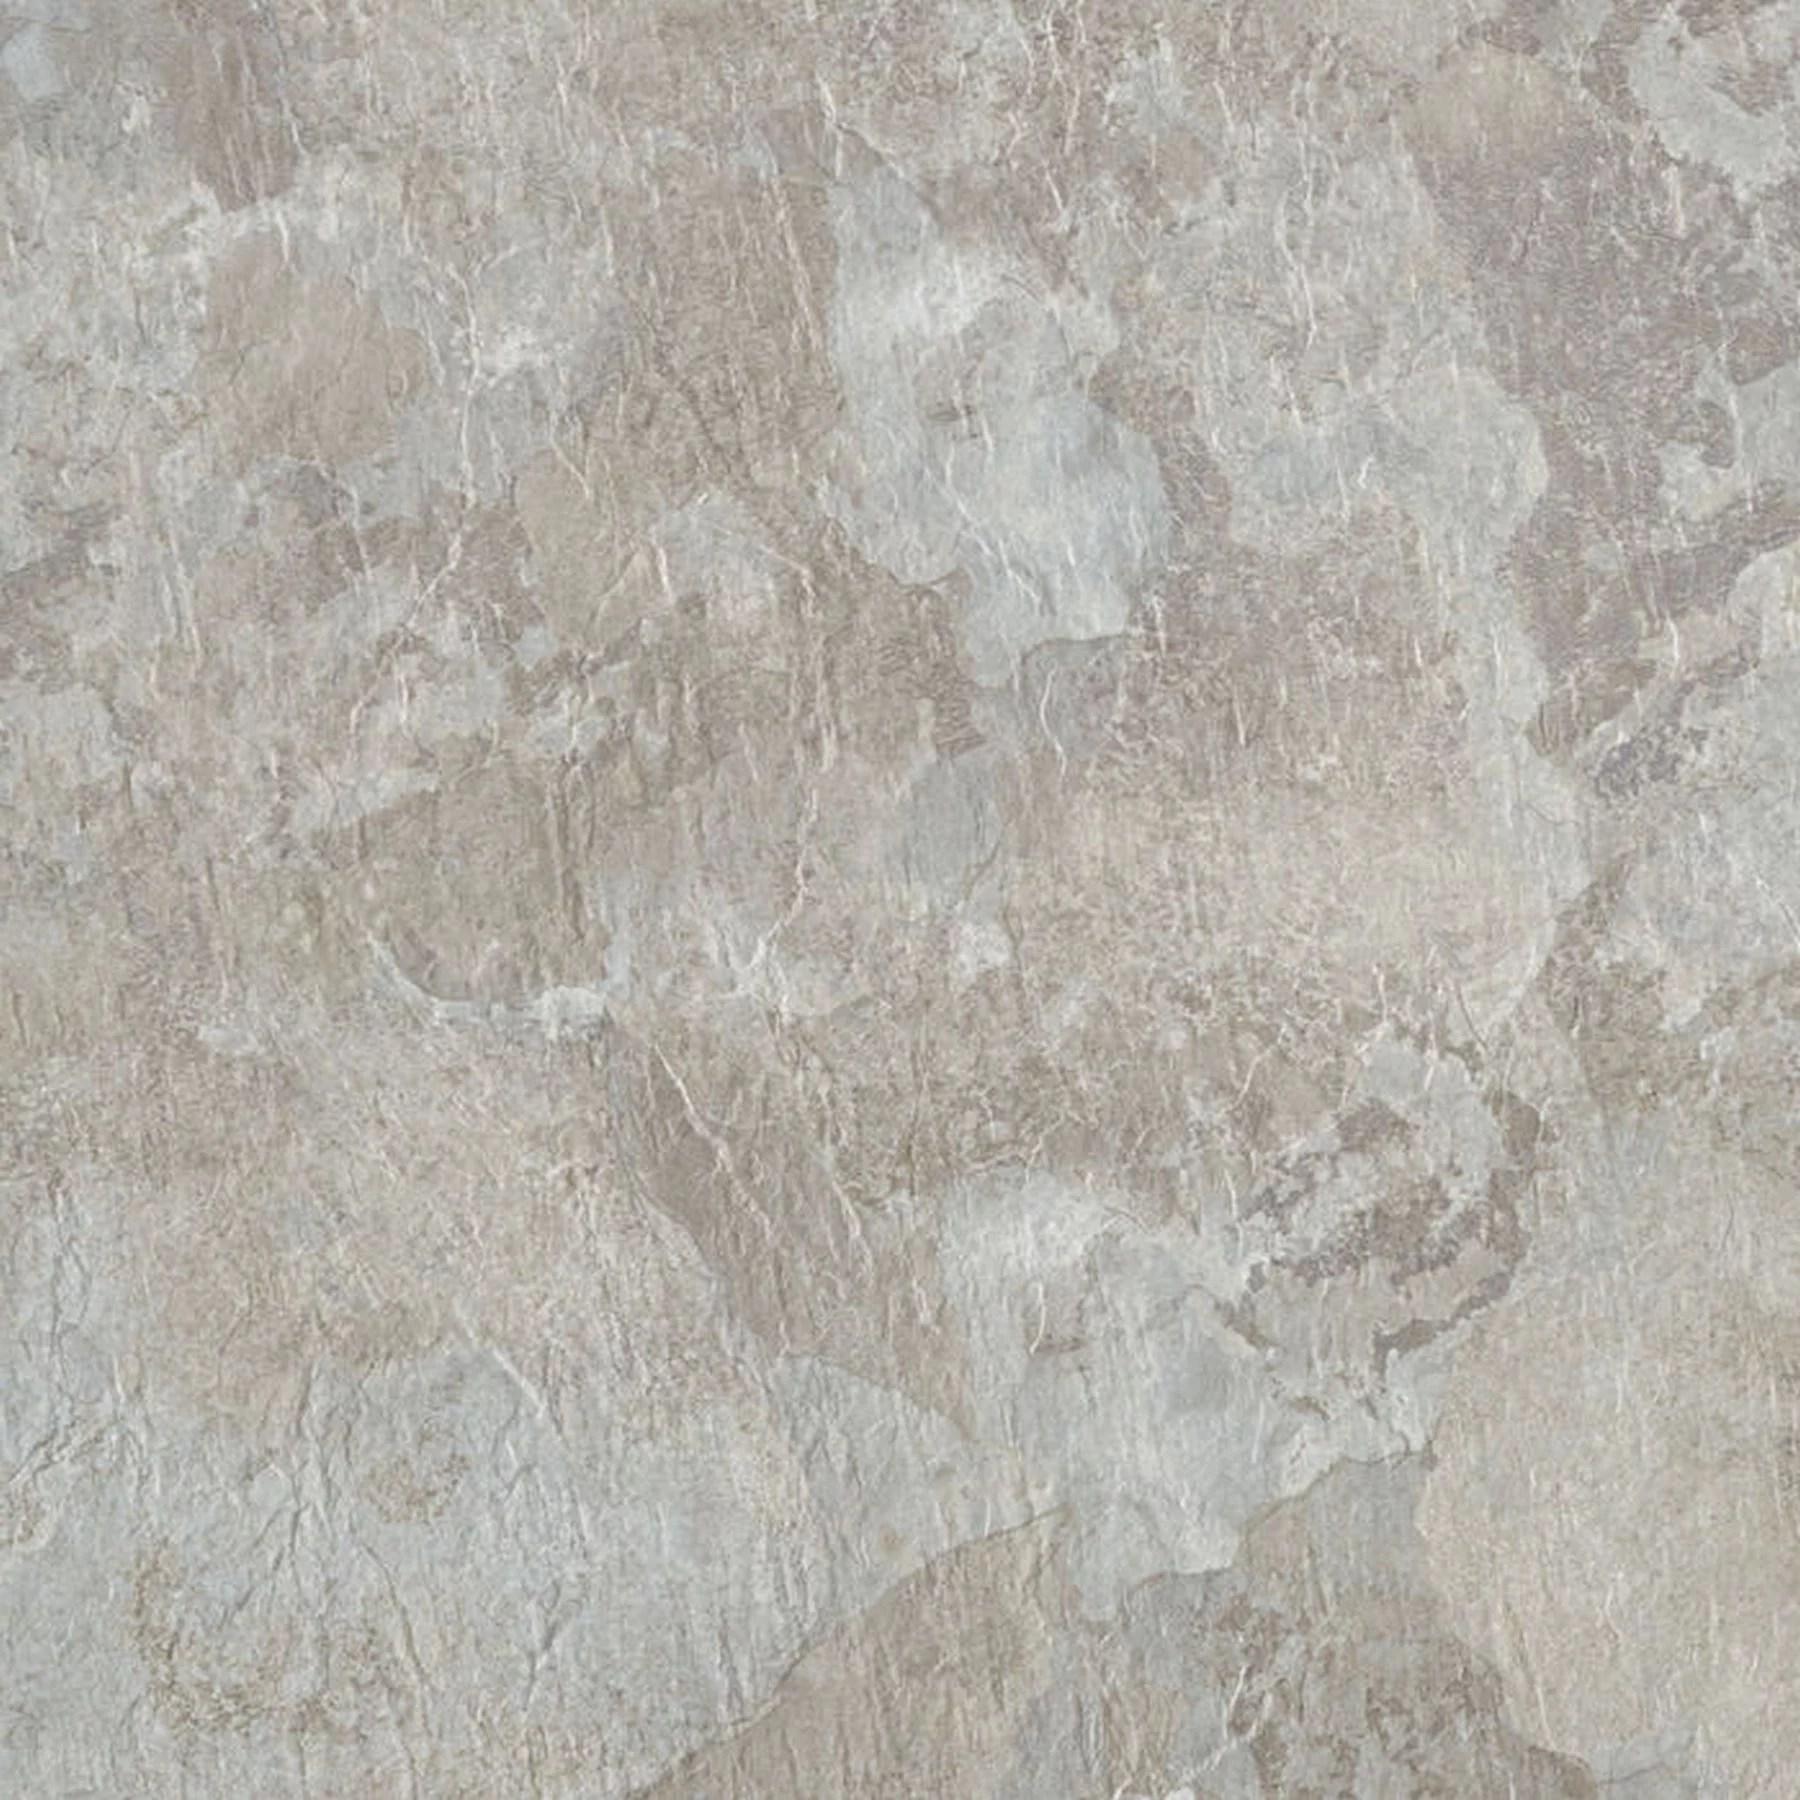 traditional elegance royale light gray slate 18x18 self adhesive vinyl floor tile 10 tiles 22 5 sq ft walmart com